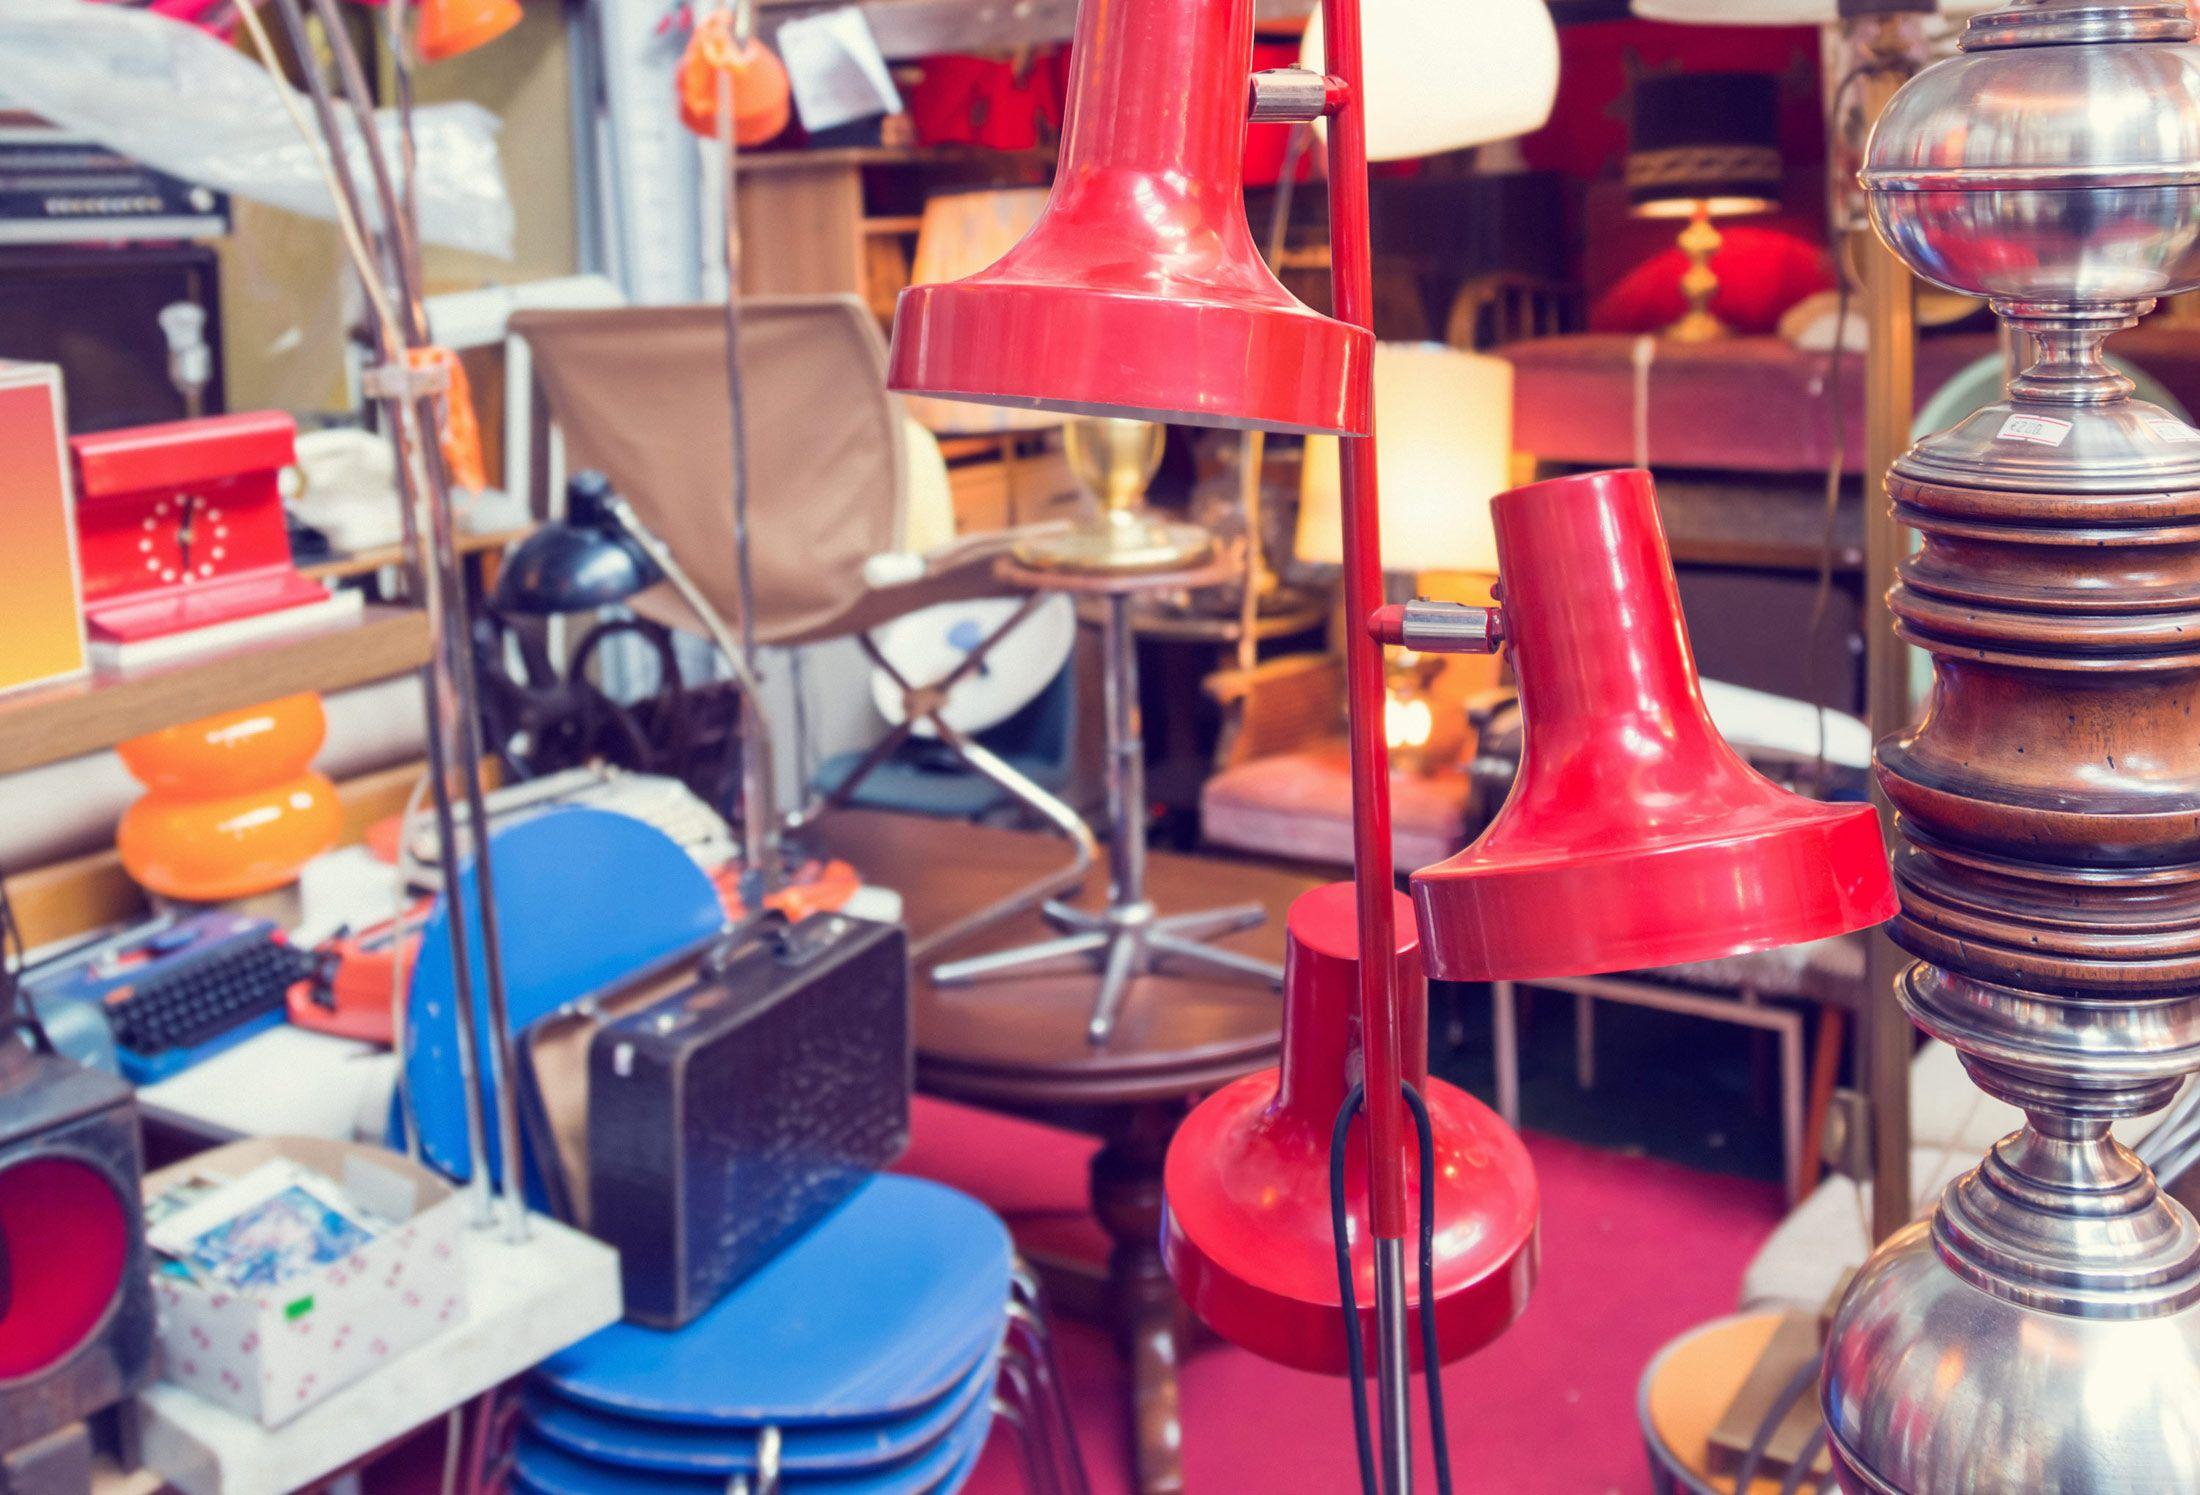 A Virtual Garage Sale Takes On Craigslist Virtual Garage Sale Craigslist Home Decor